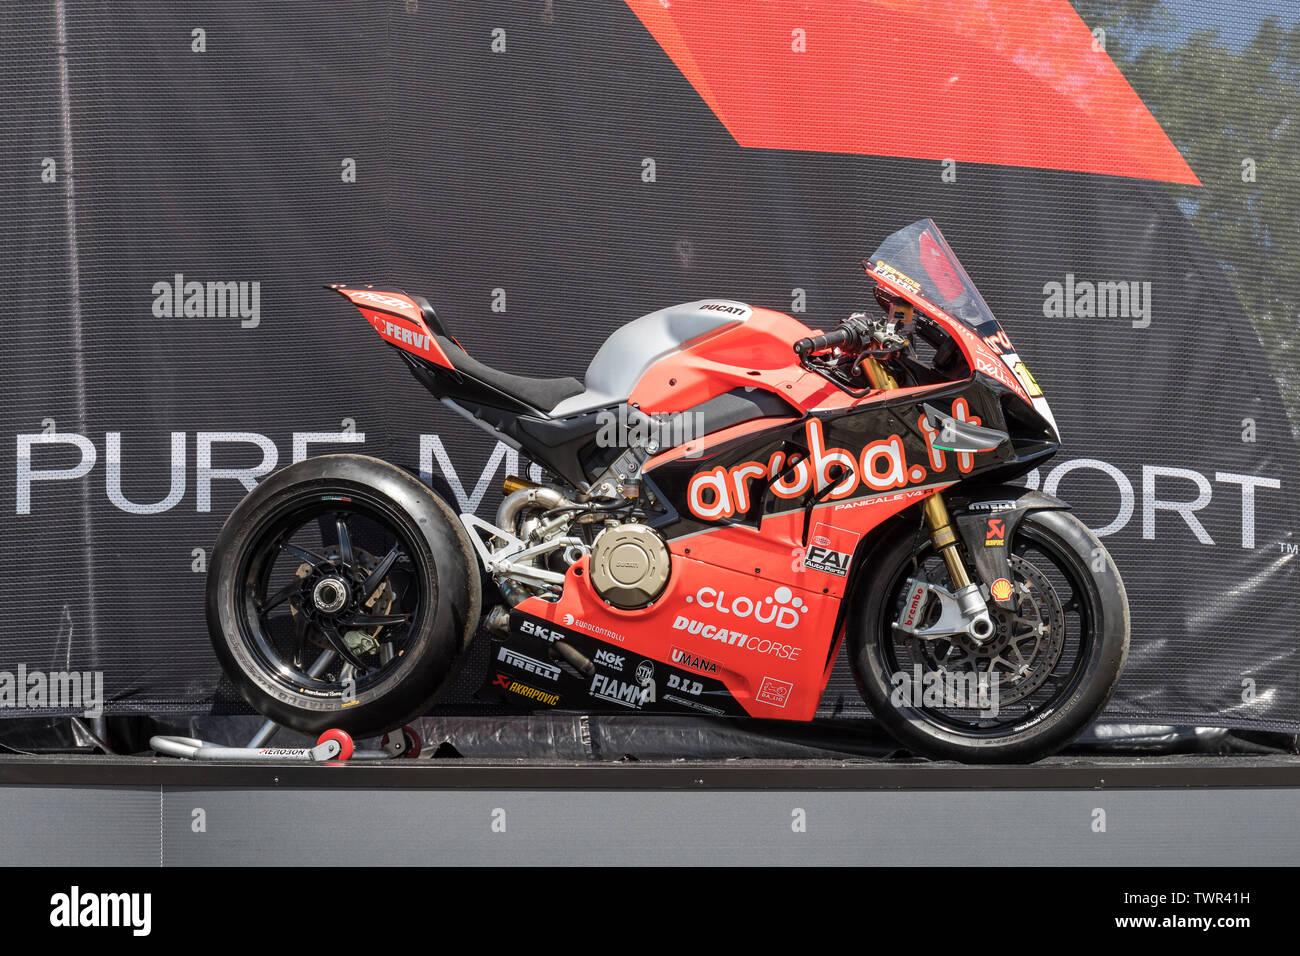 Ducati Panigale V4 R of Alvaro Bautista, Aruba.it Racing - Ducati team Stock Photo